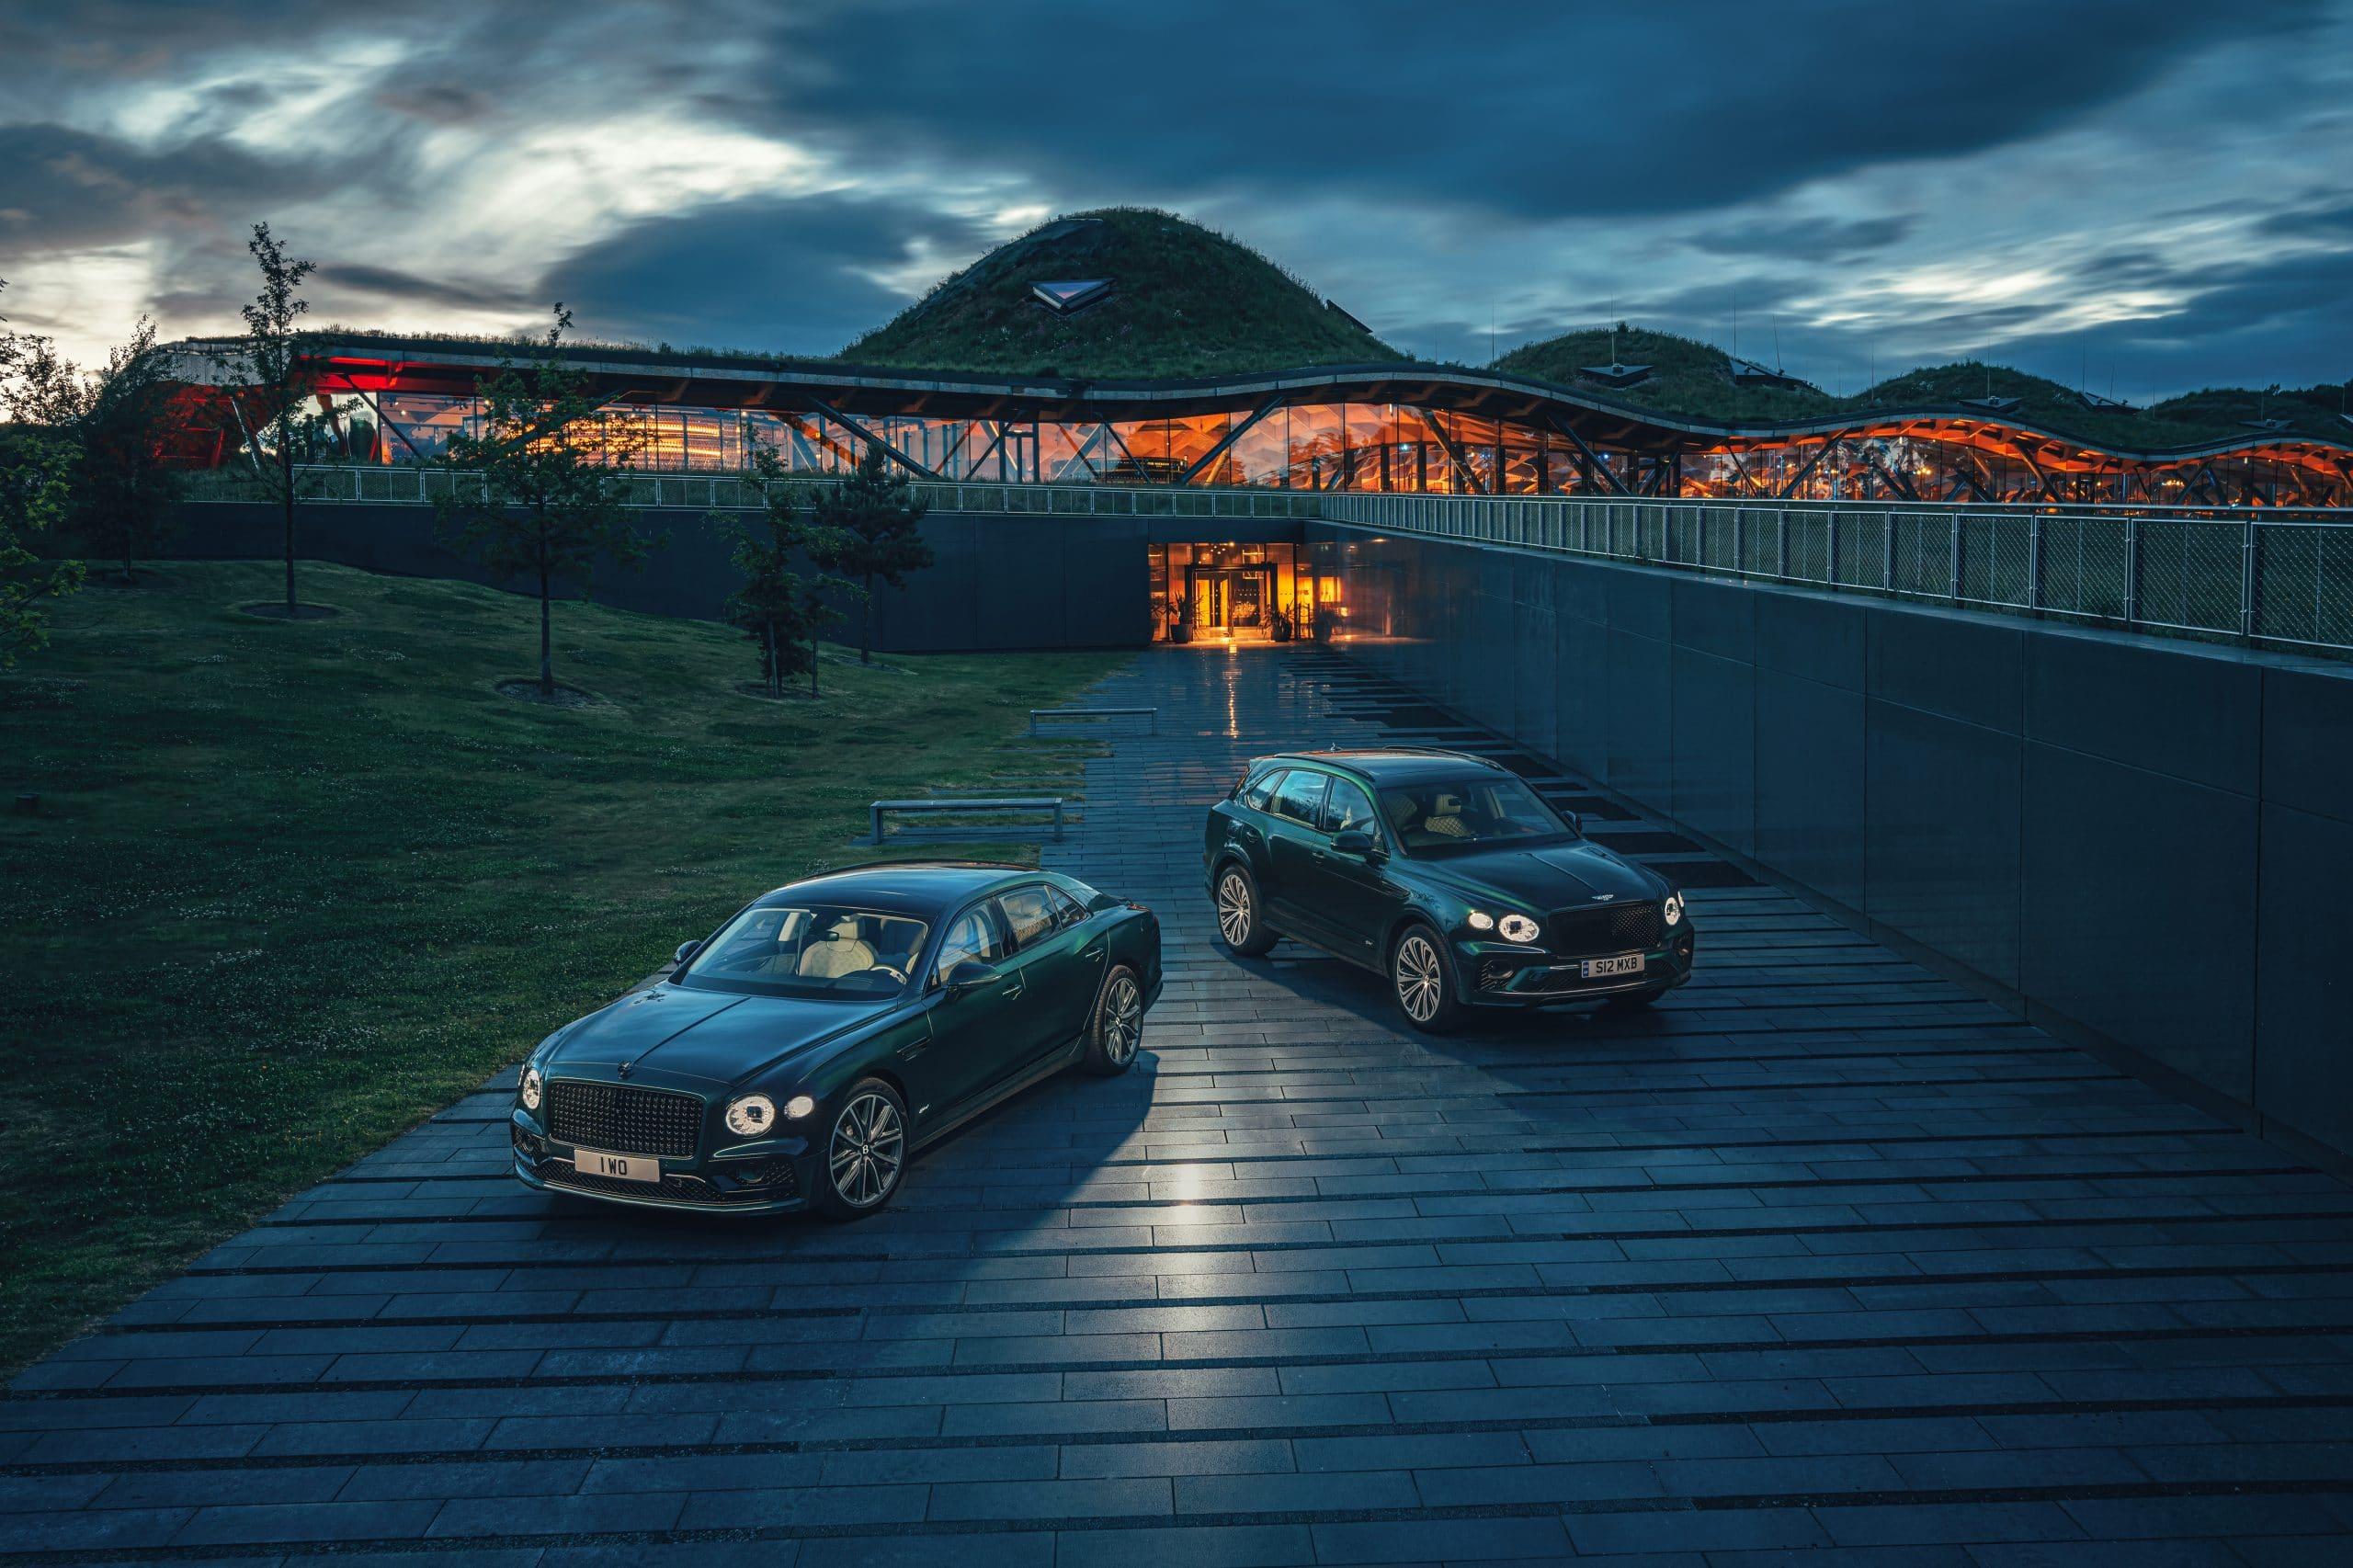 Bentley x Macallan 1 scaled Γιατί η Bentley συνεργάζεται με έναν οίκο παραγωγής ουίσκι Bentley, Macallan, videos, zblog, ειδήσεις, Νέα